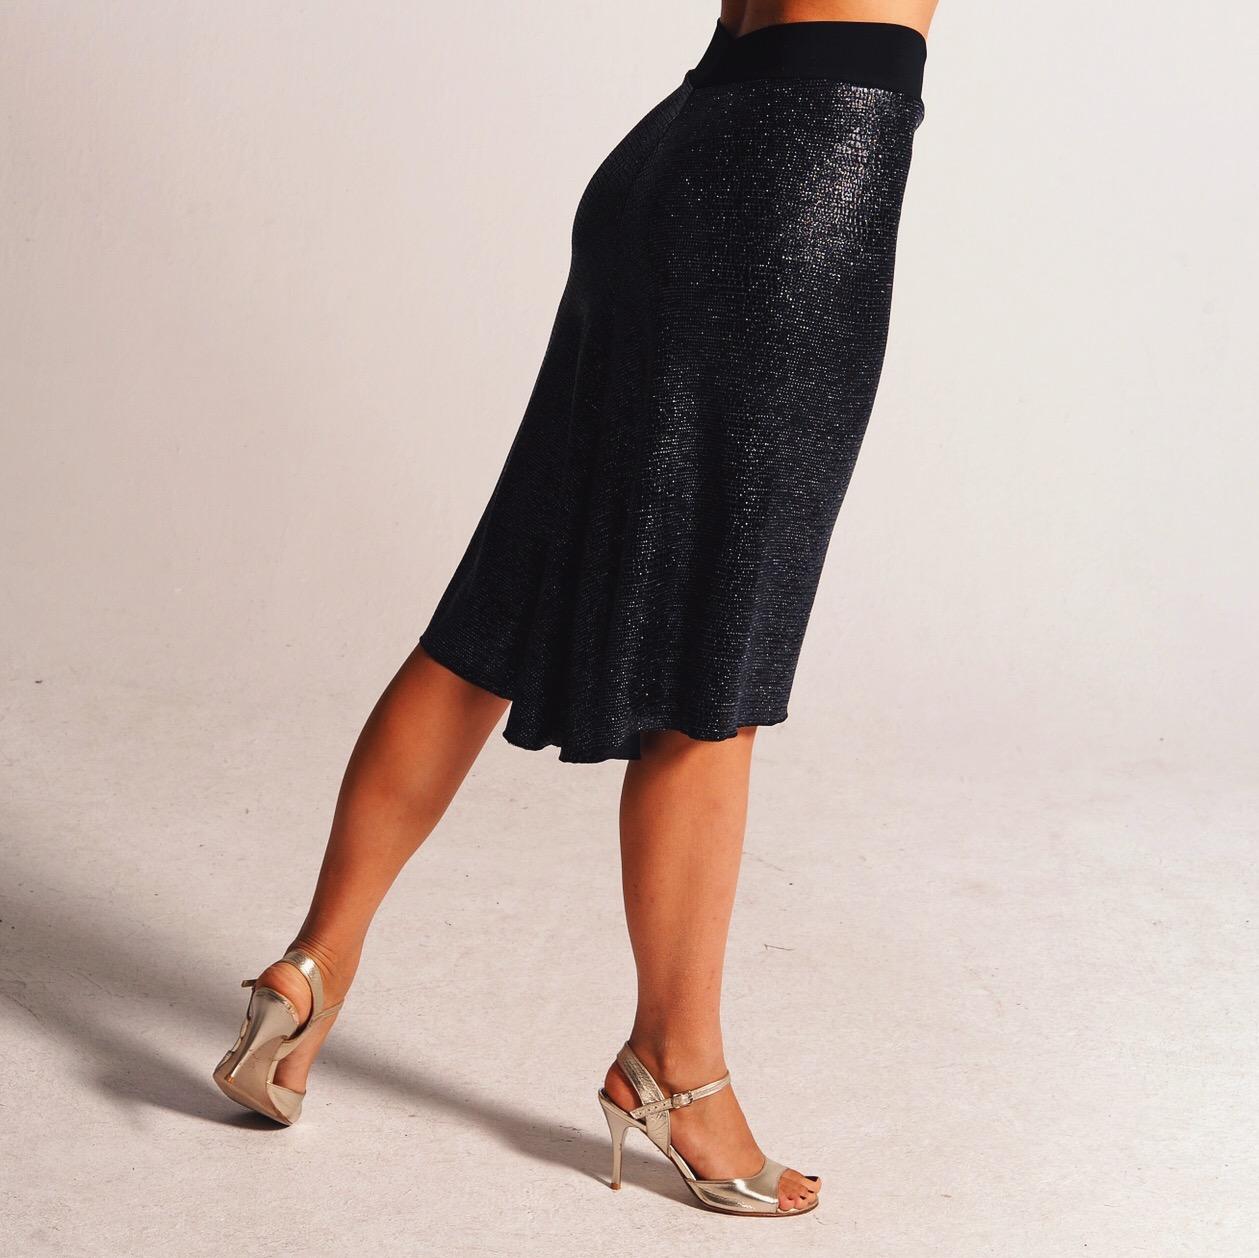 tango_skirt_starry_black_coleccionberlin.JPG